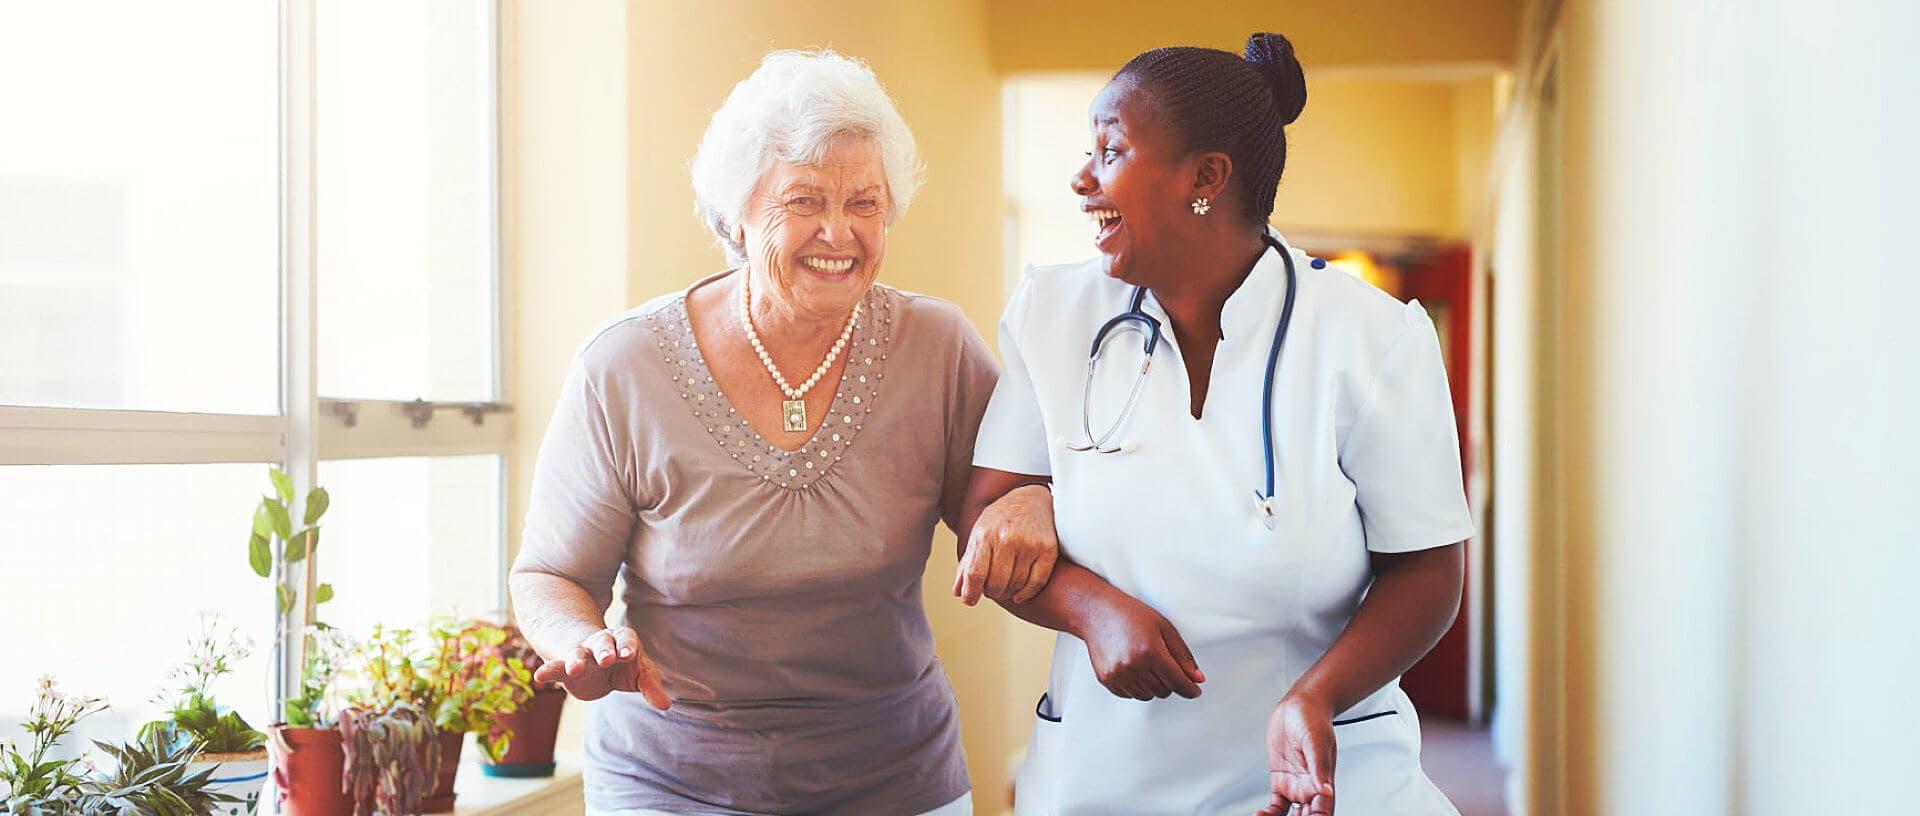 nurse and senior woman having a conversation while walking at the hallway